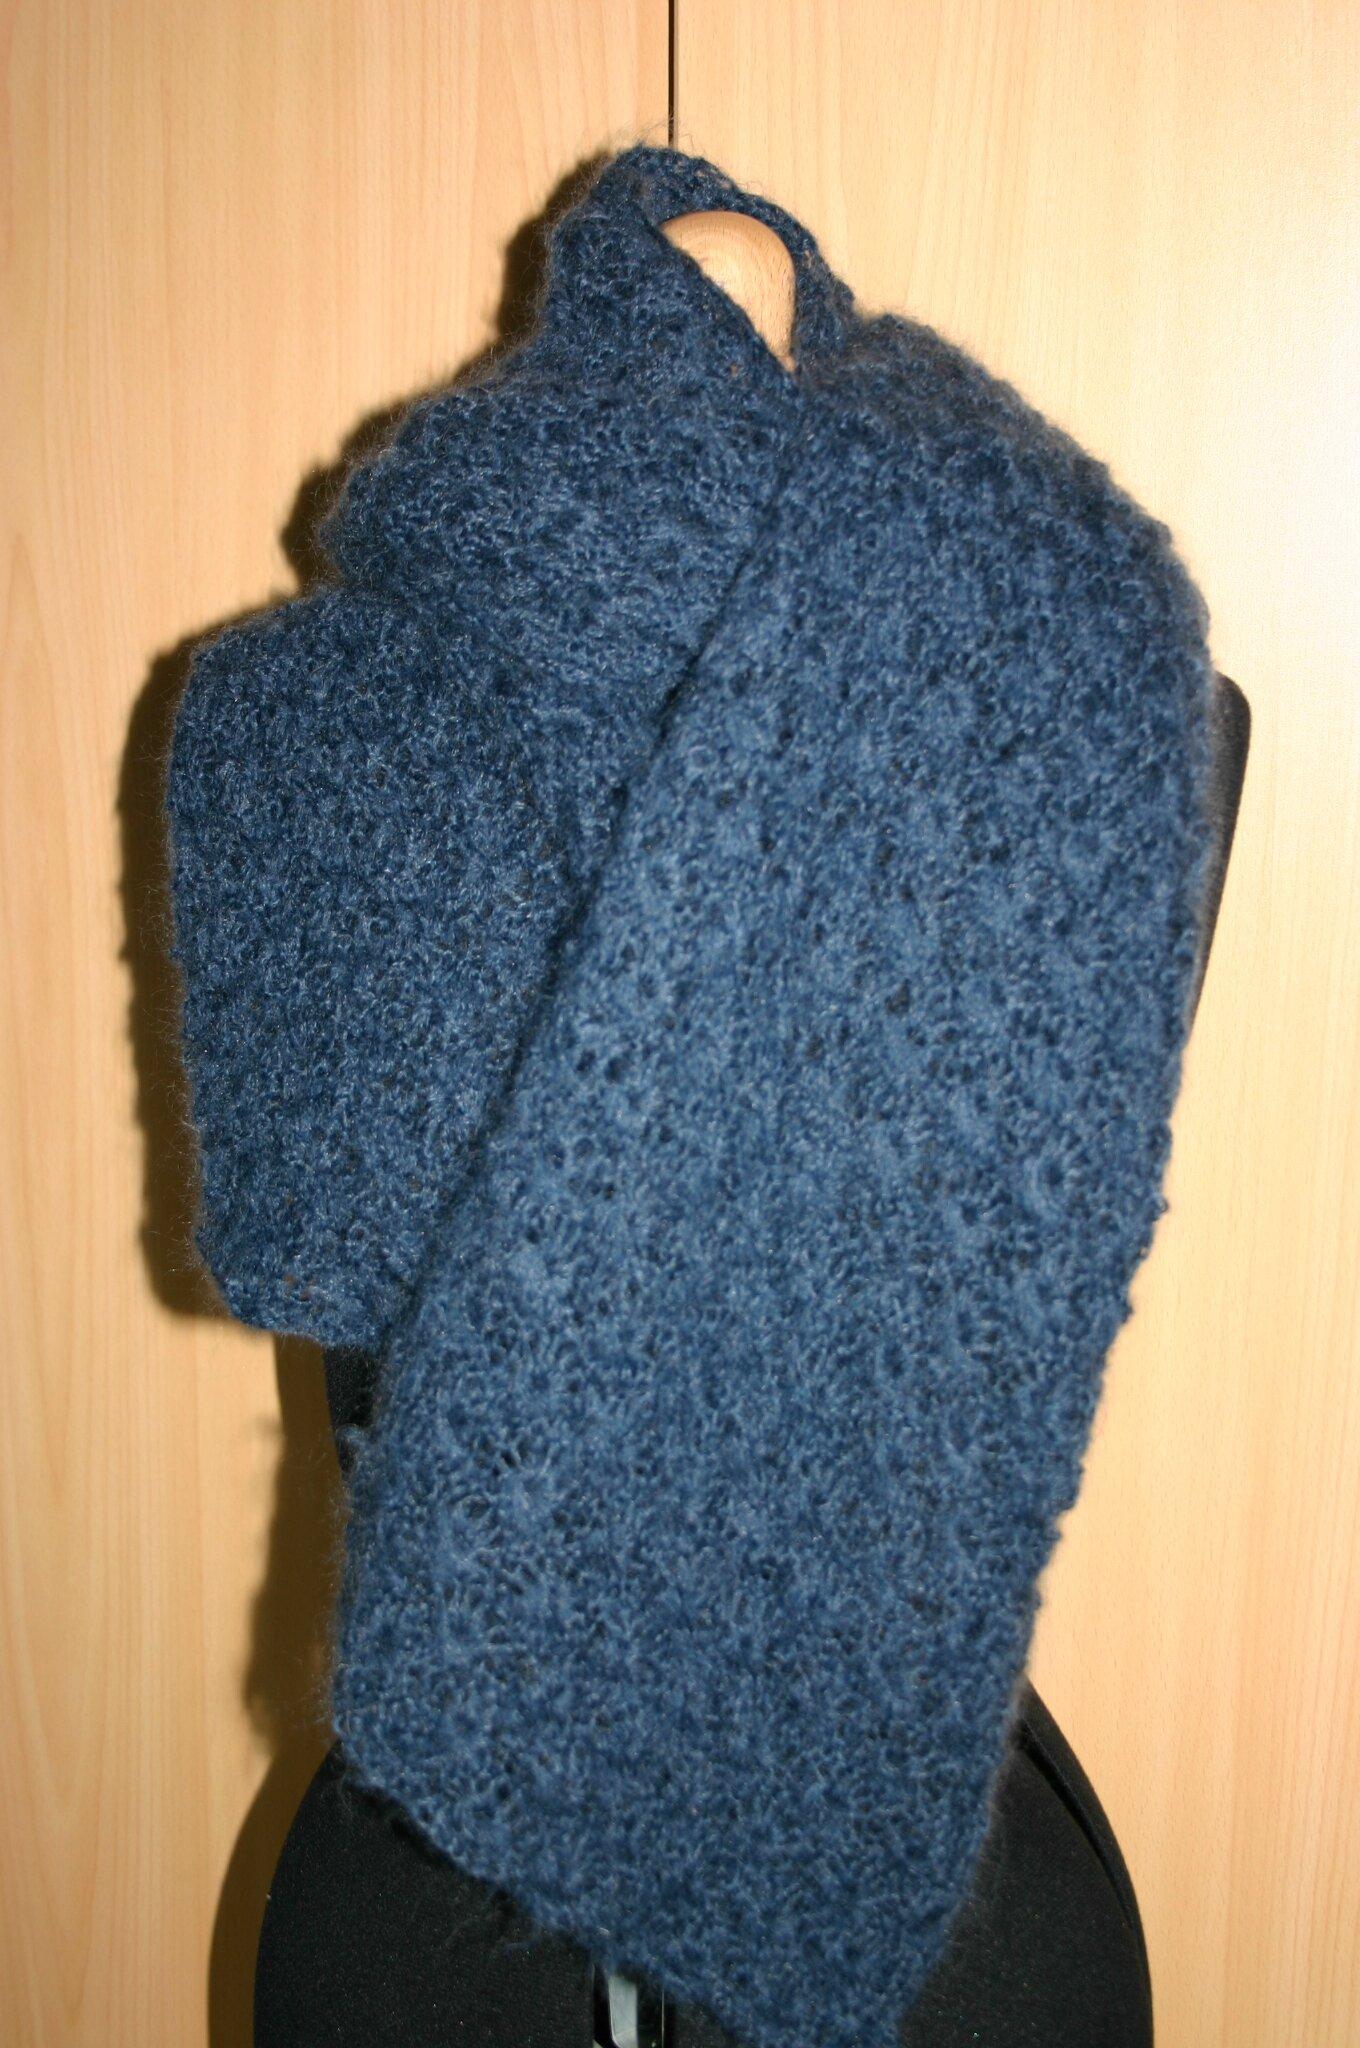 écharpe bleue 002